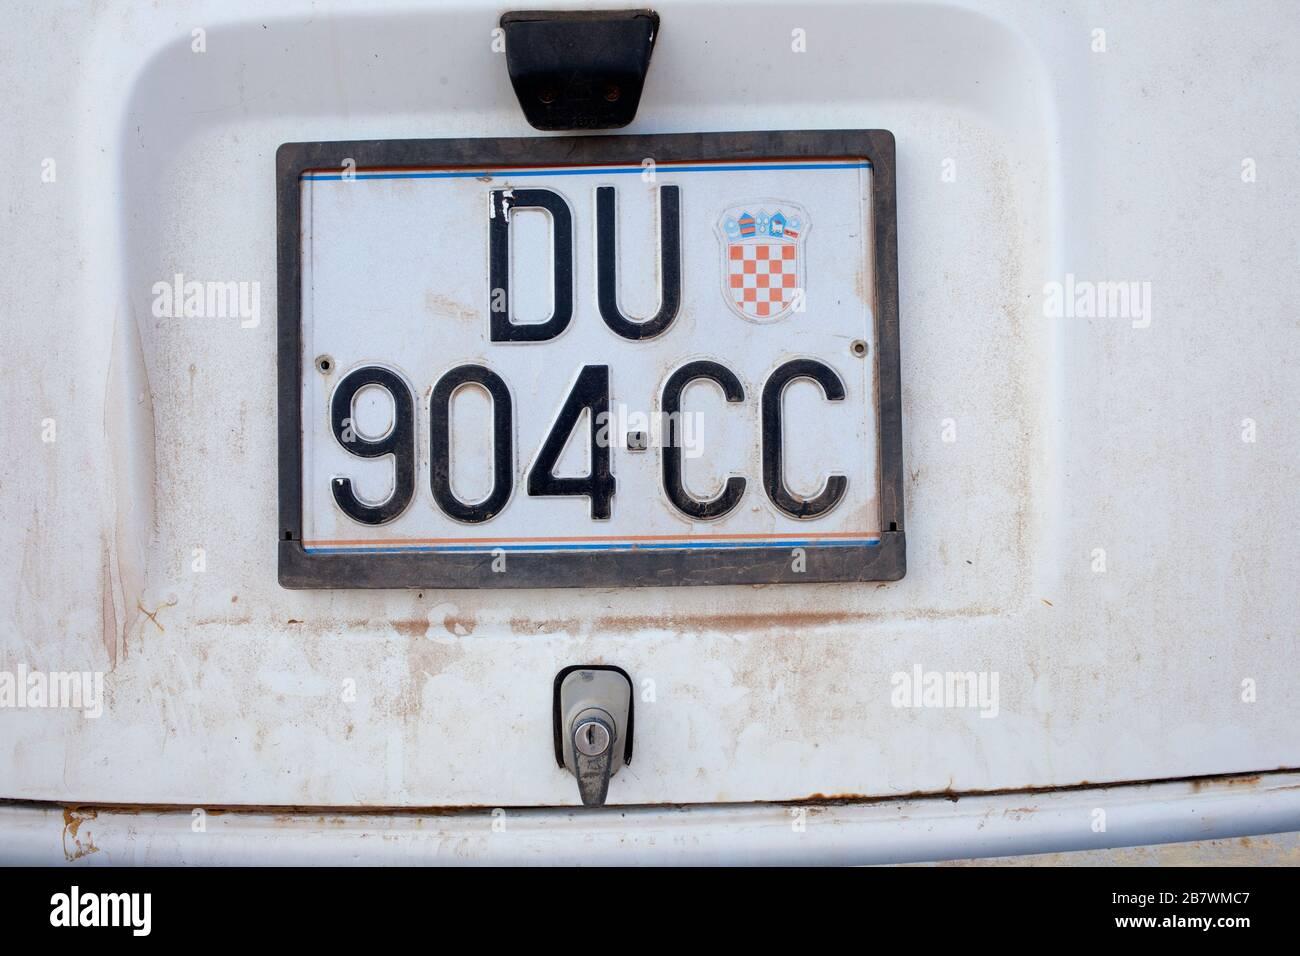 Croacia placa de coche. Croacia (Europa) Foto de stock